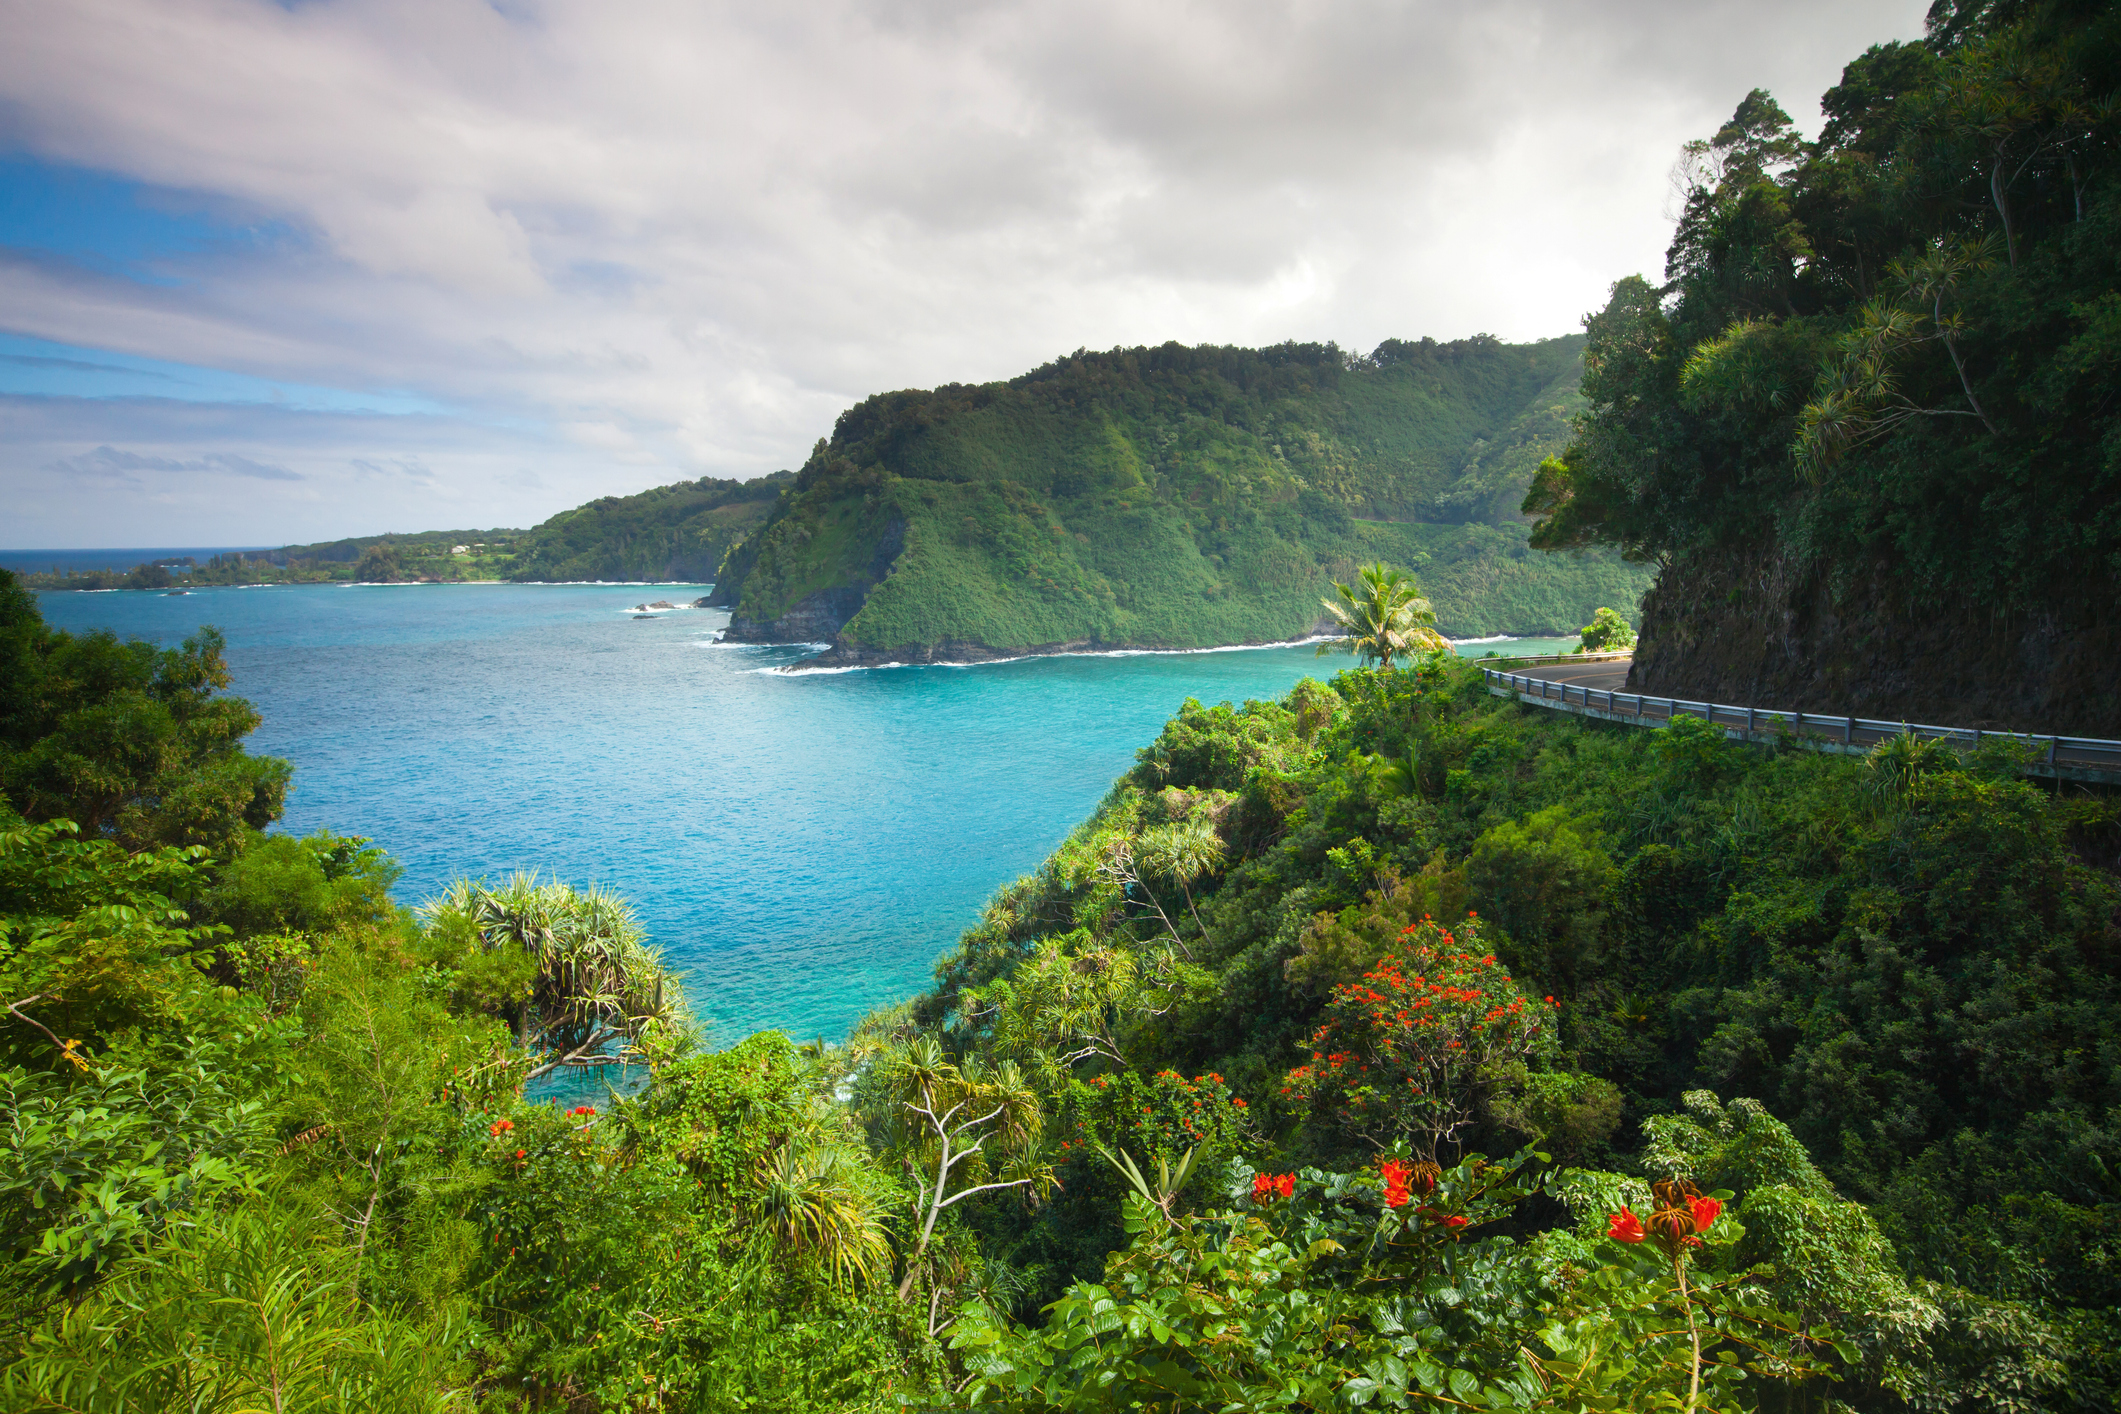 A narrow part of the road to Hana hugs the cliffside near the ocean.